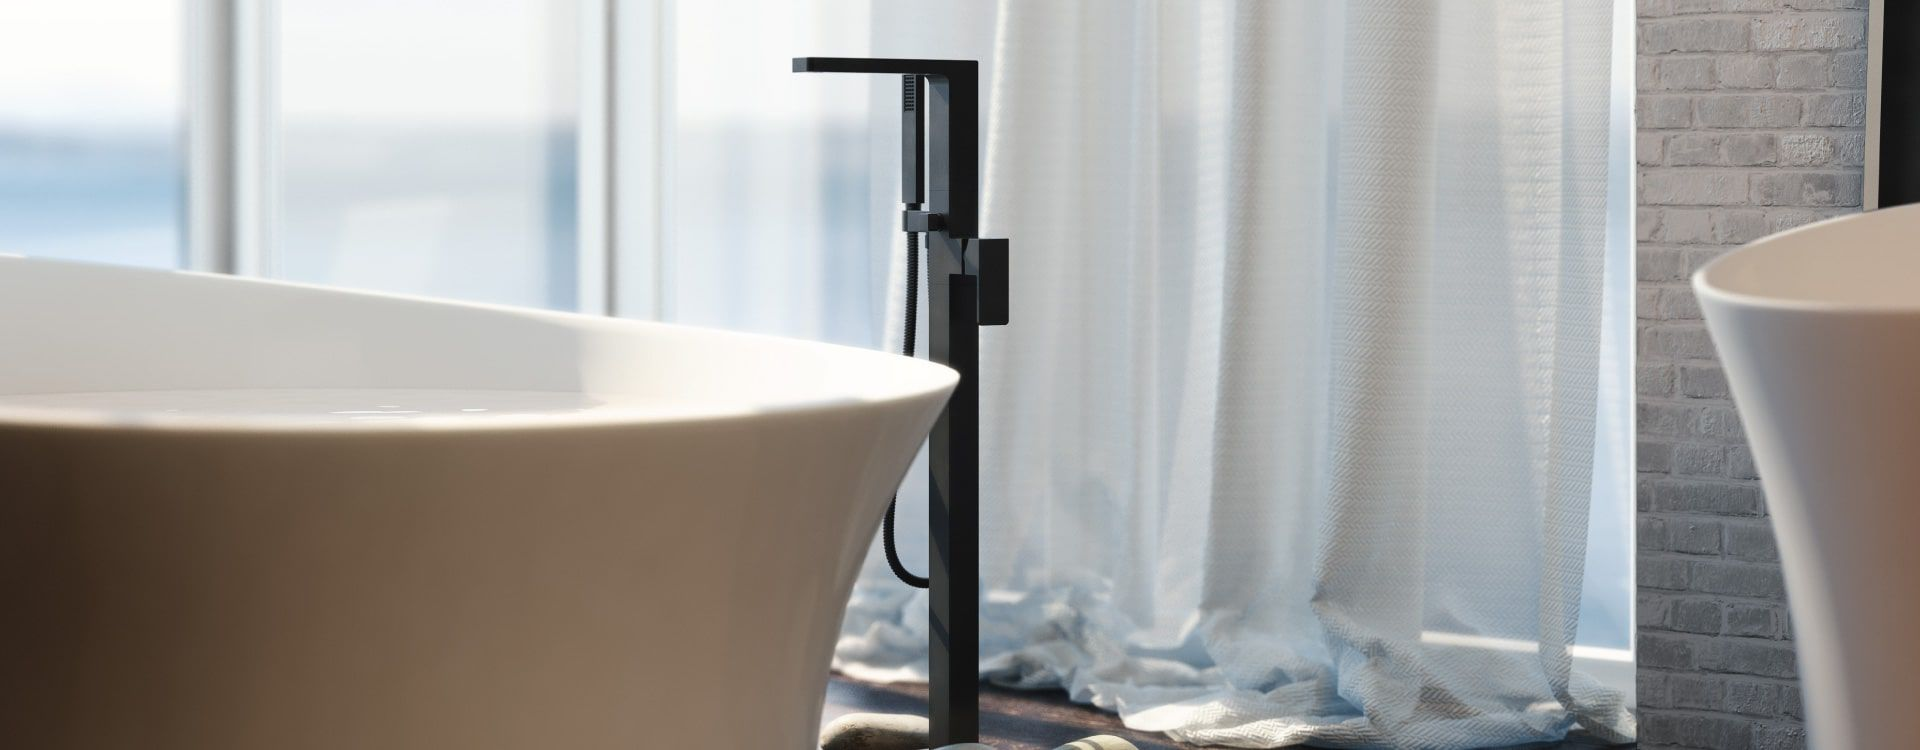 RM Living Cincinnati Interior Design Modern Faucet by Isenberg Isenberg6